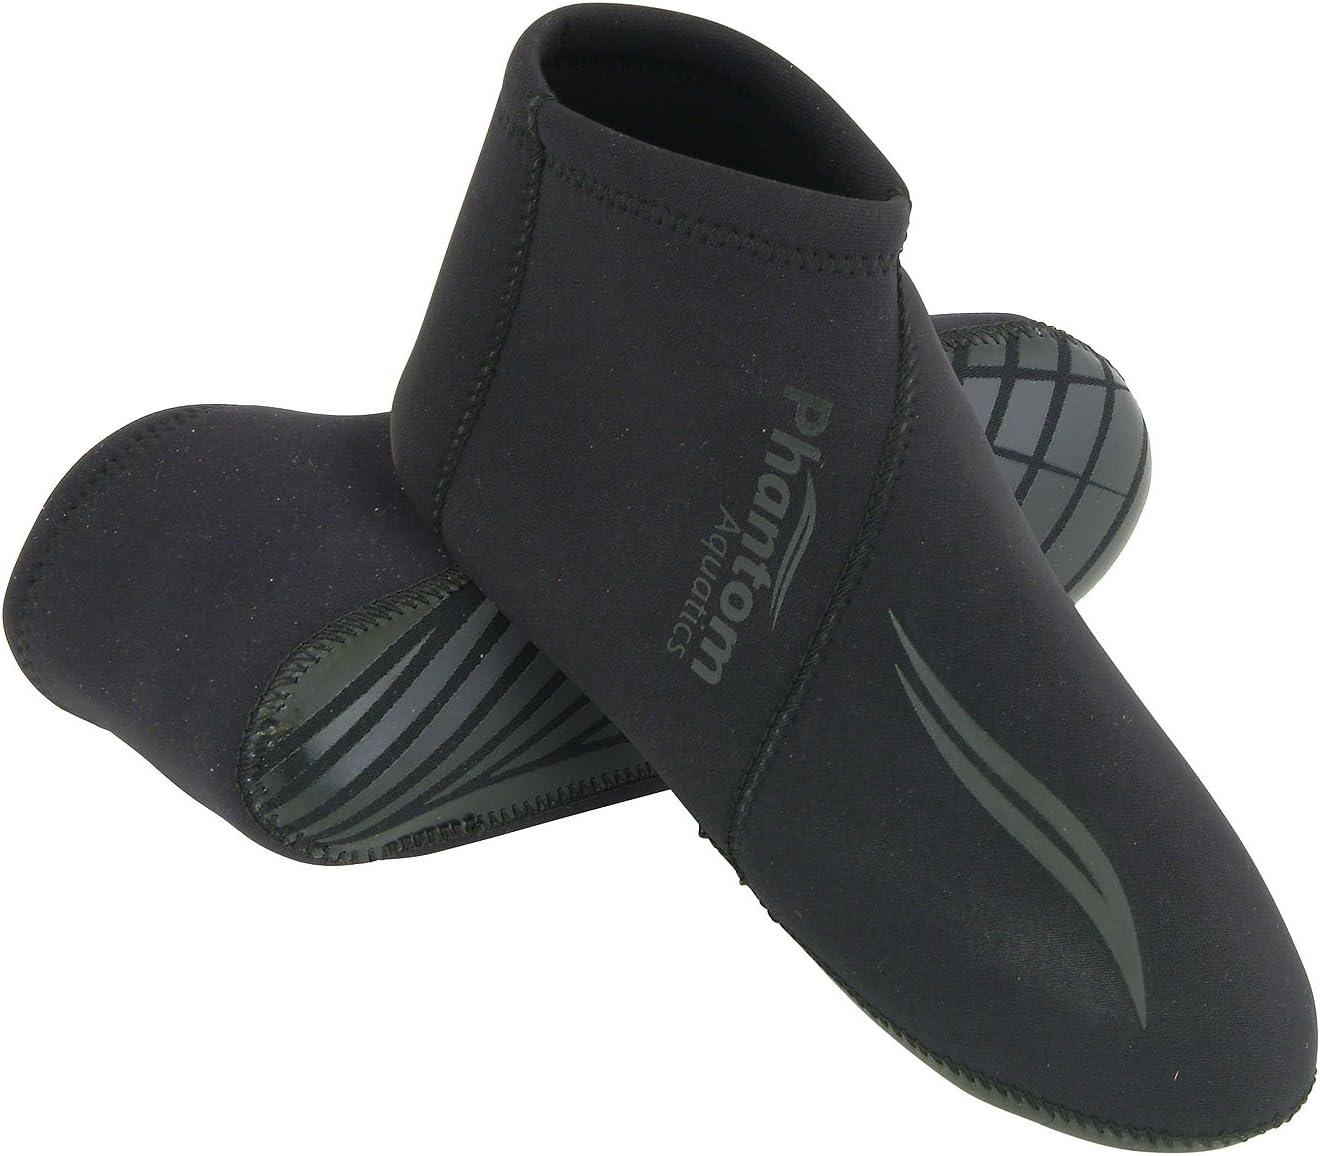 Phantom Aquatics Premium Neoprene 3mm Neoprene Water Sock, BK-SM